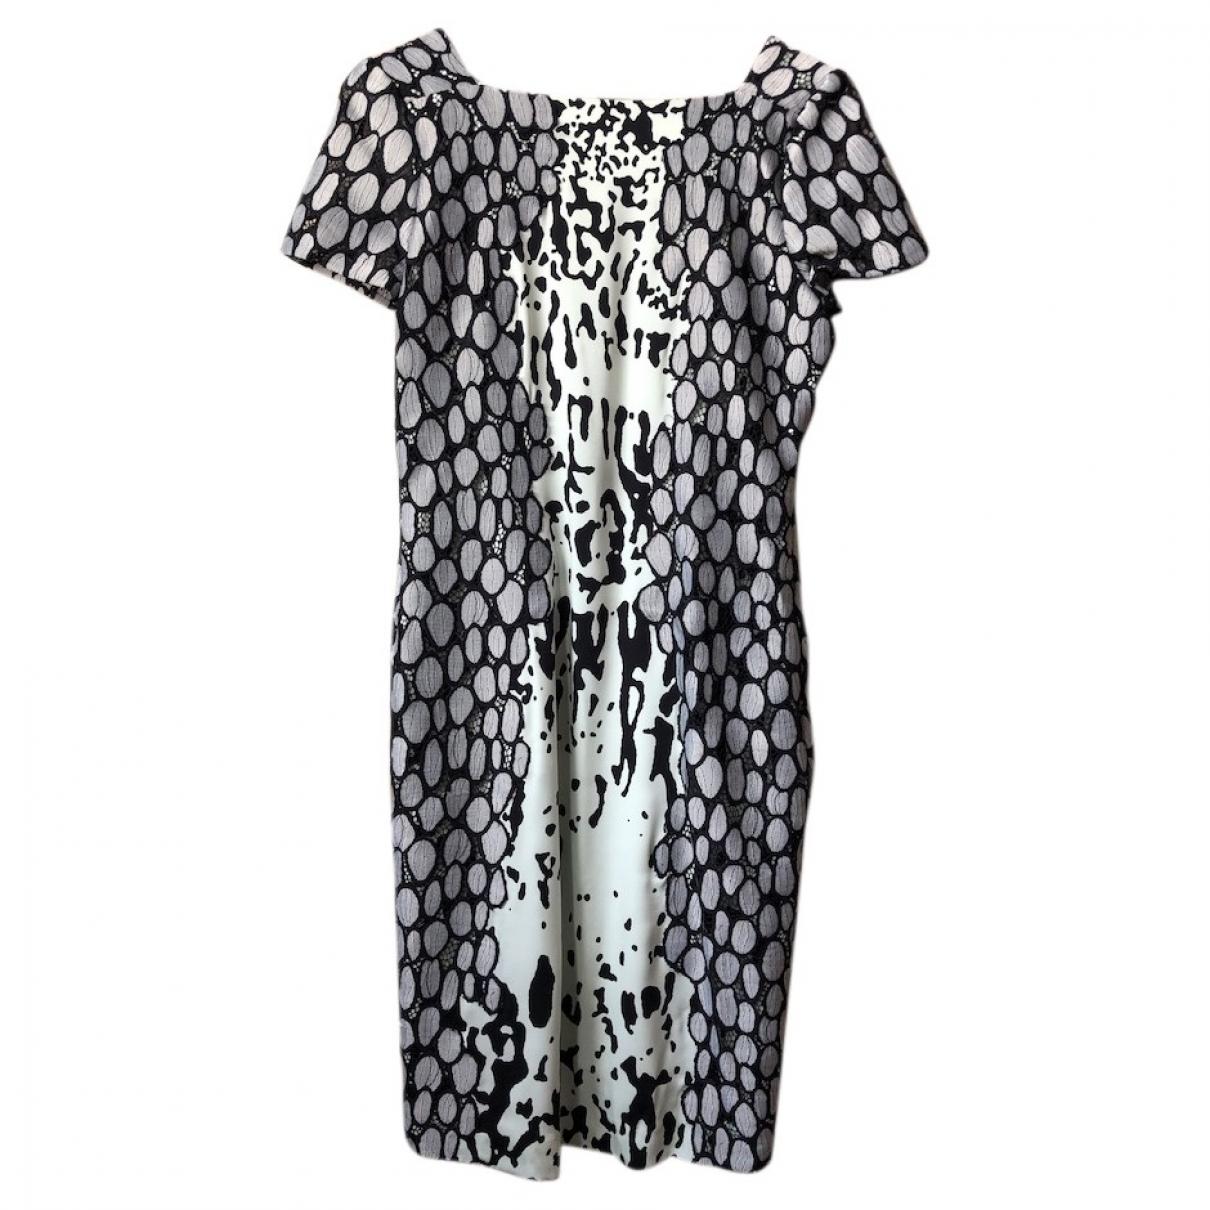 Diane Von Furstenberg \N Multicolour dress for Women 8 UK